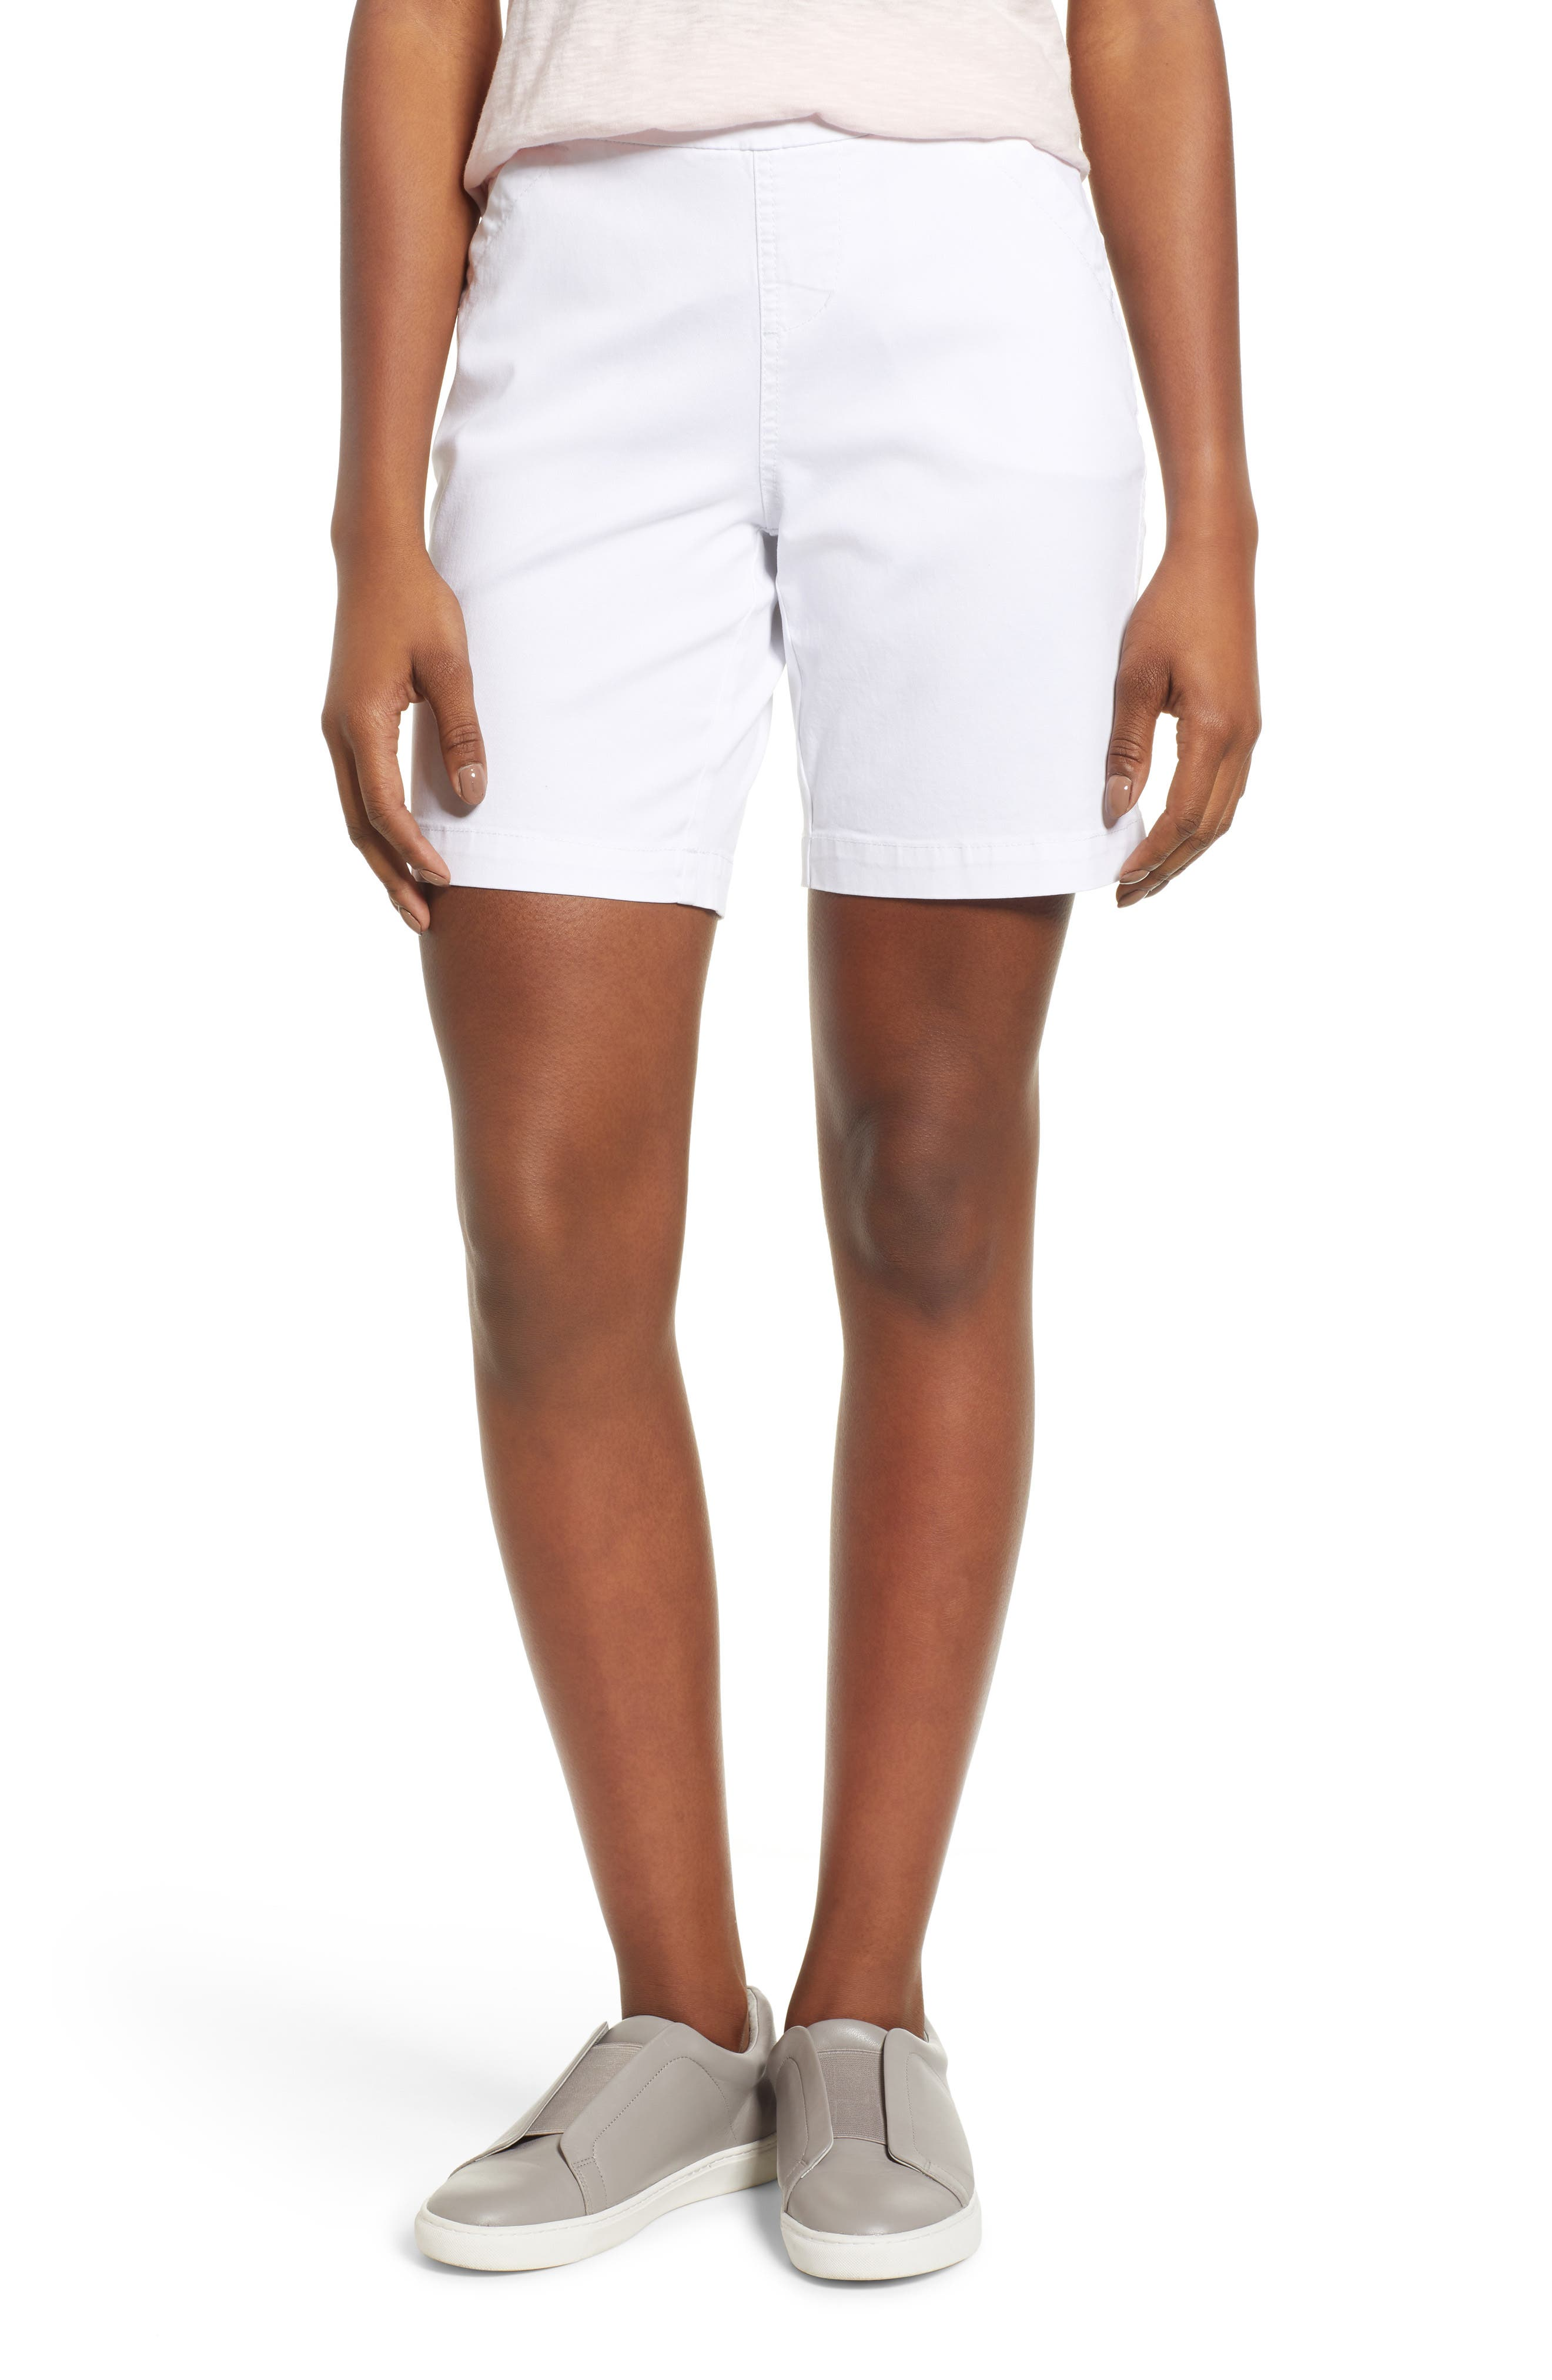 Women's Jag Jeans Gracie Stretch Cotton Shorts